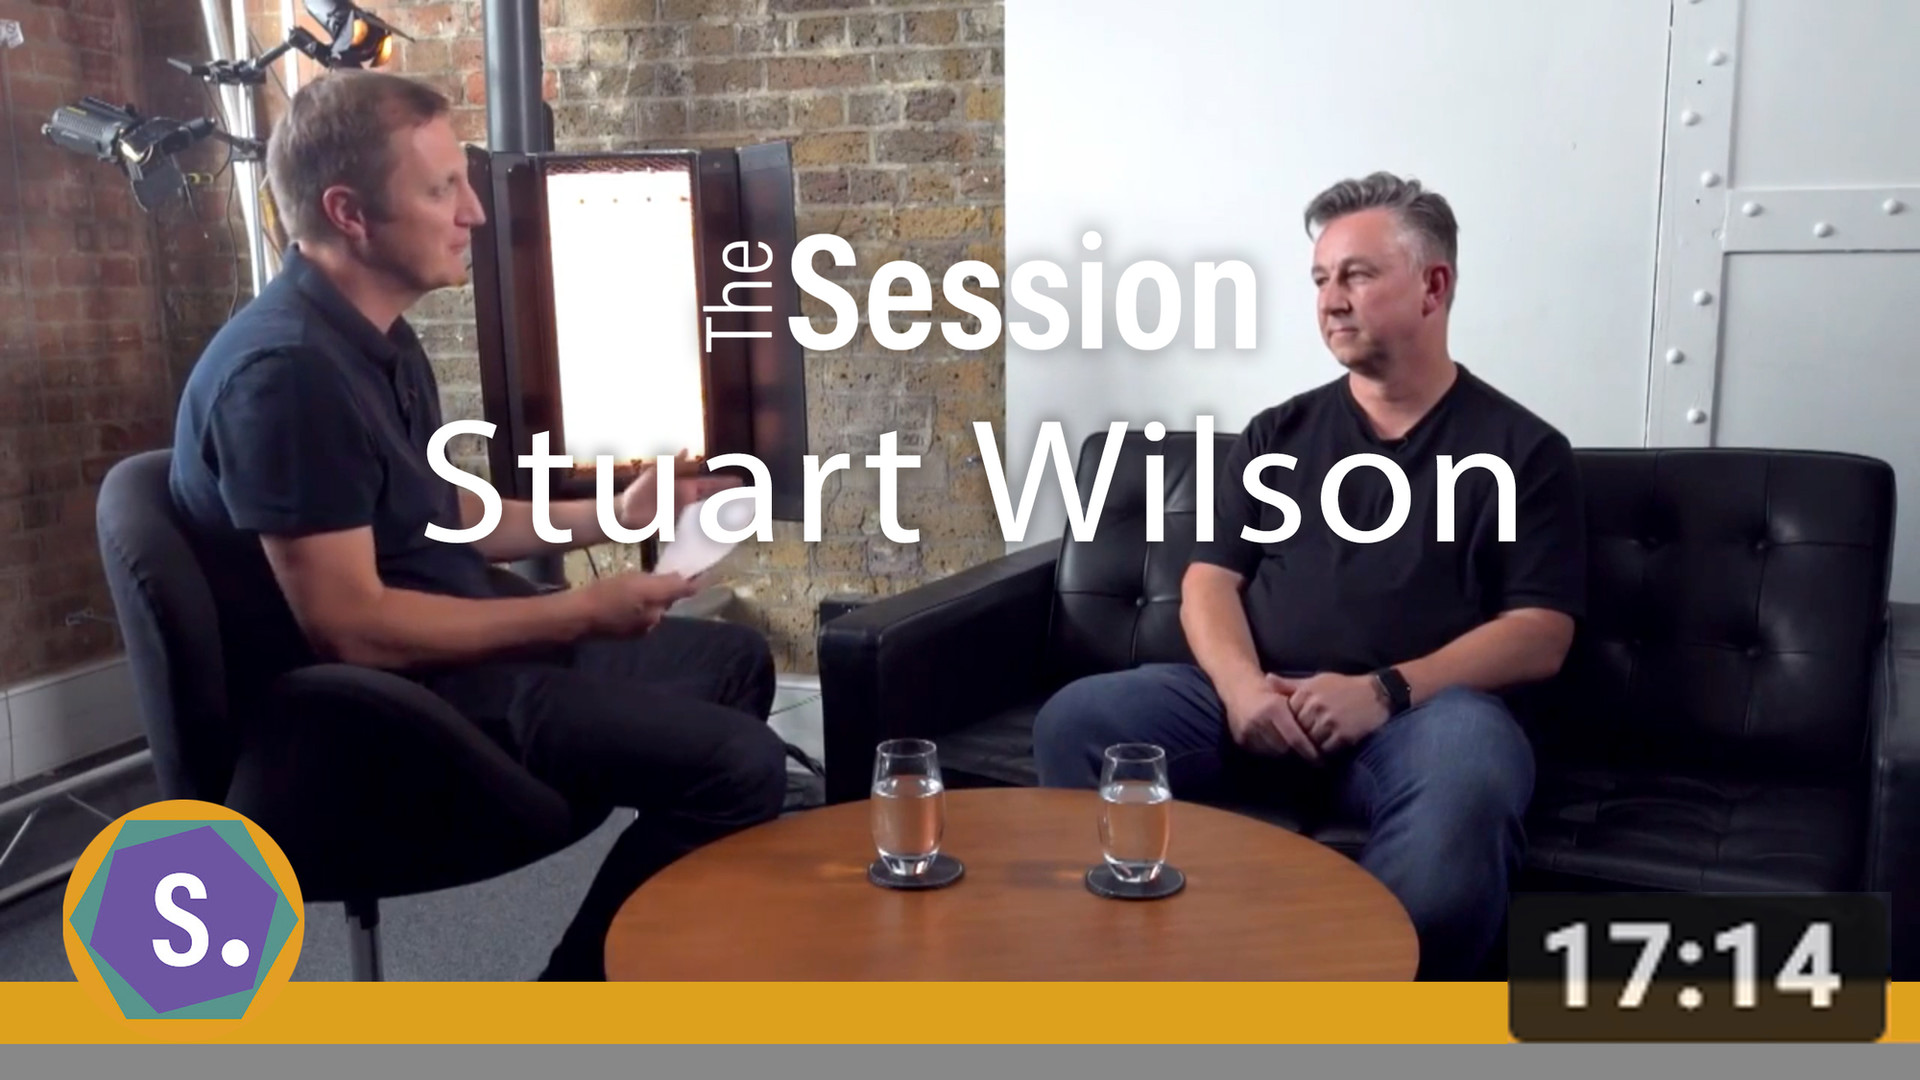 Hub.tv The Session - Episode 6